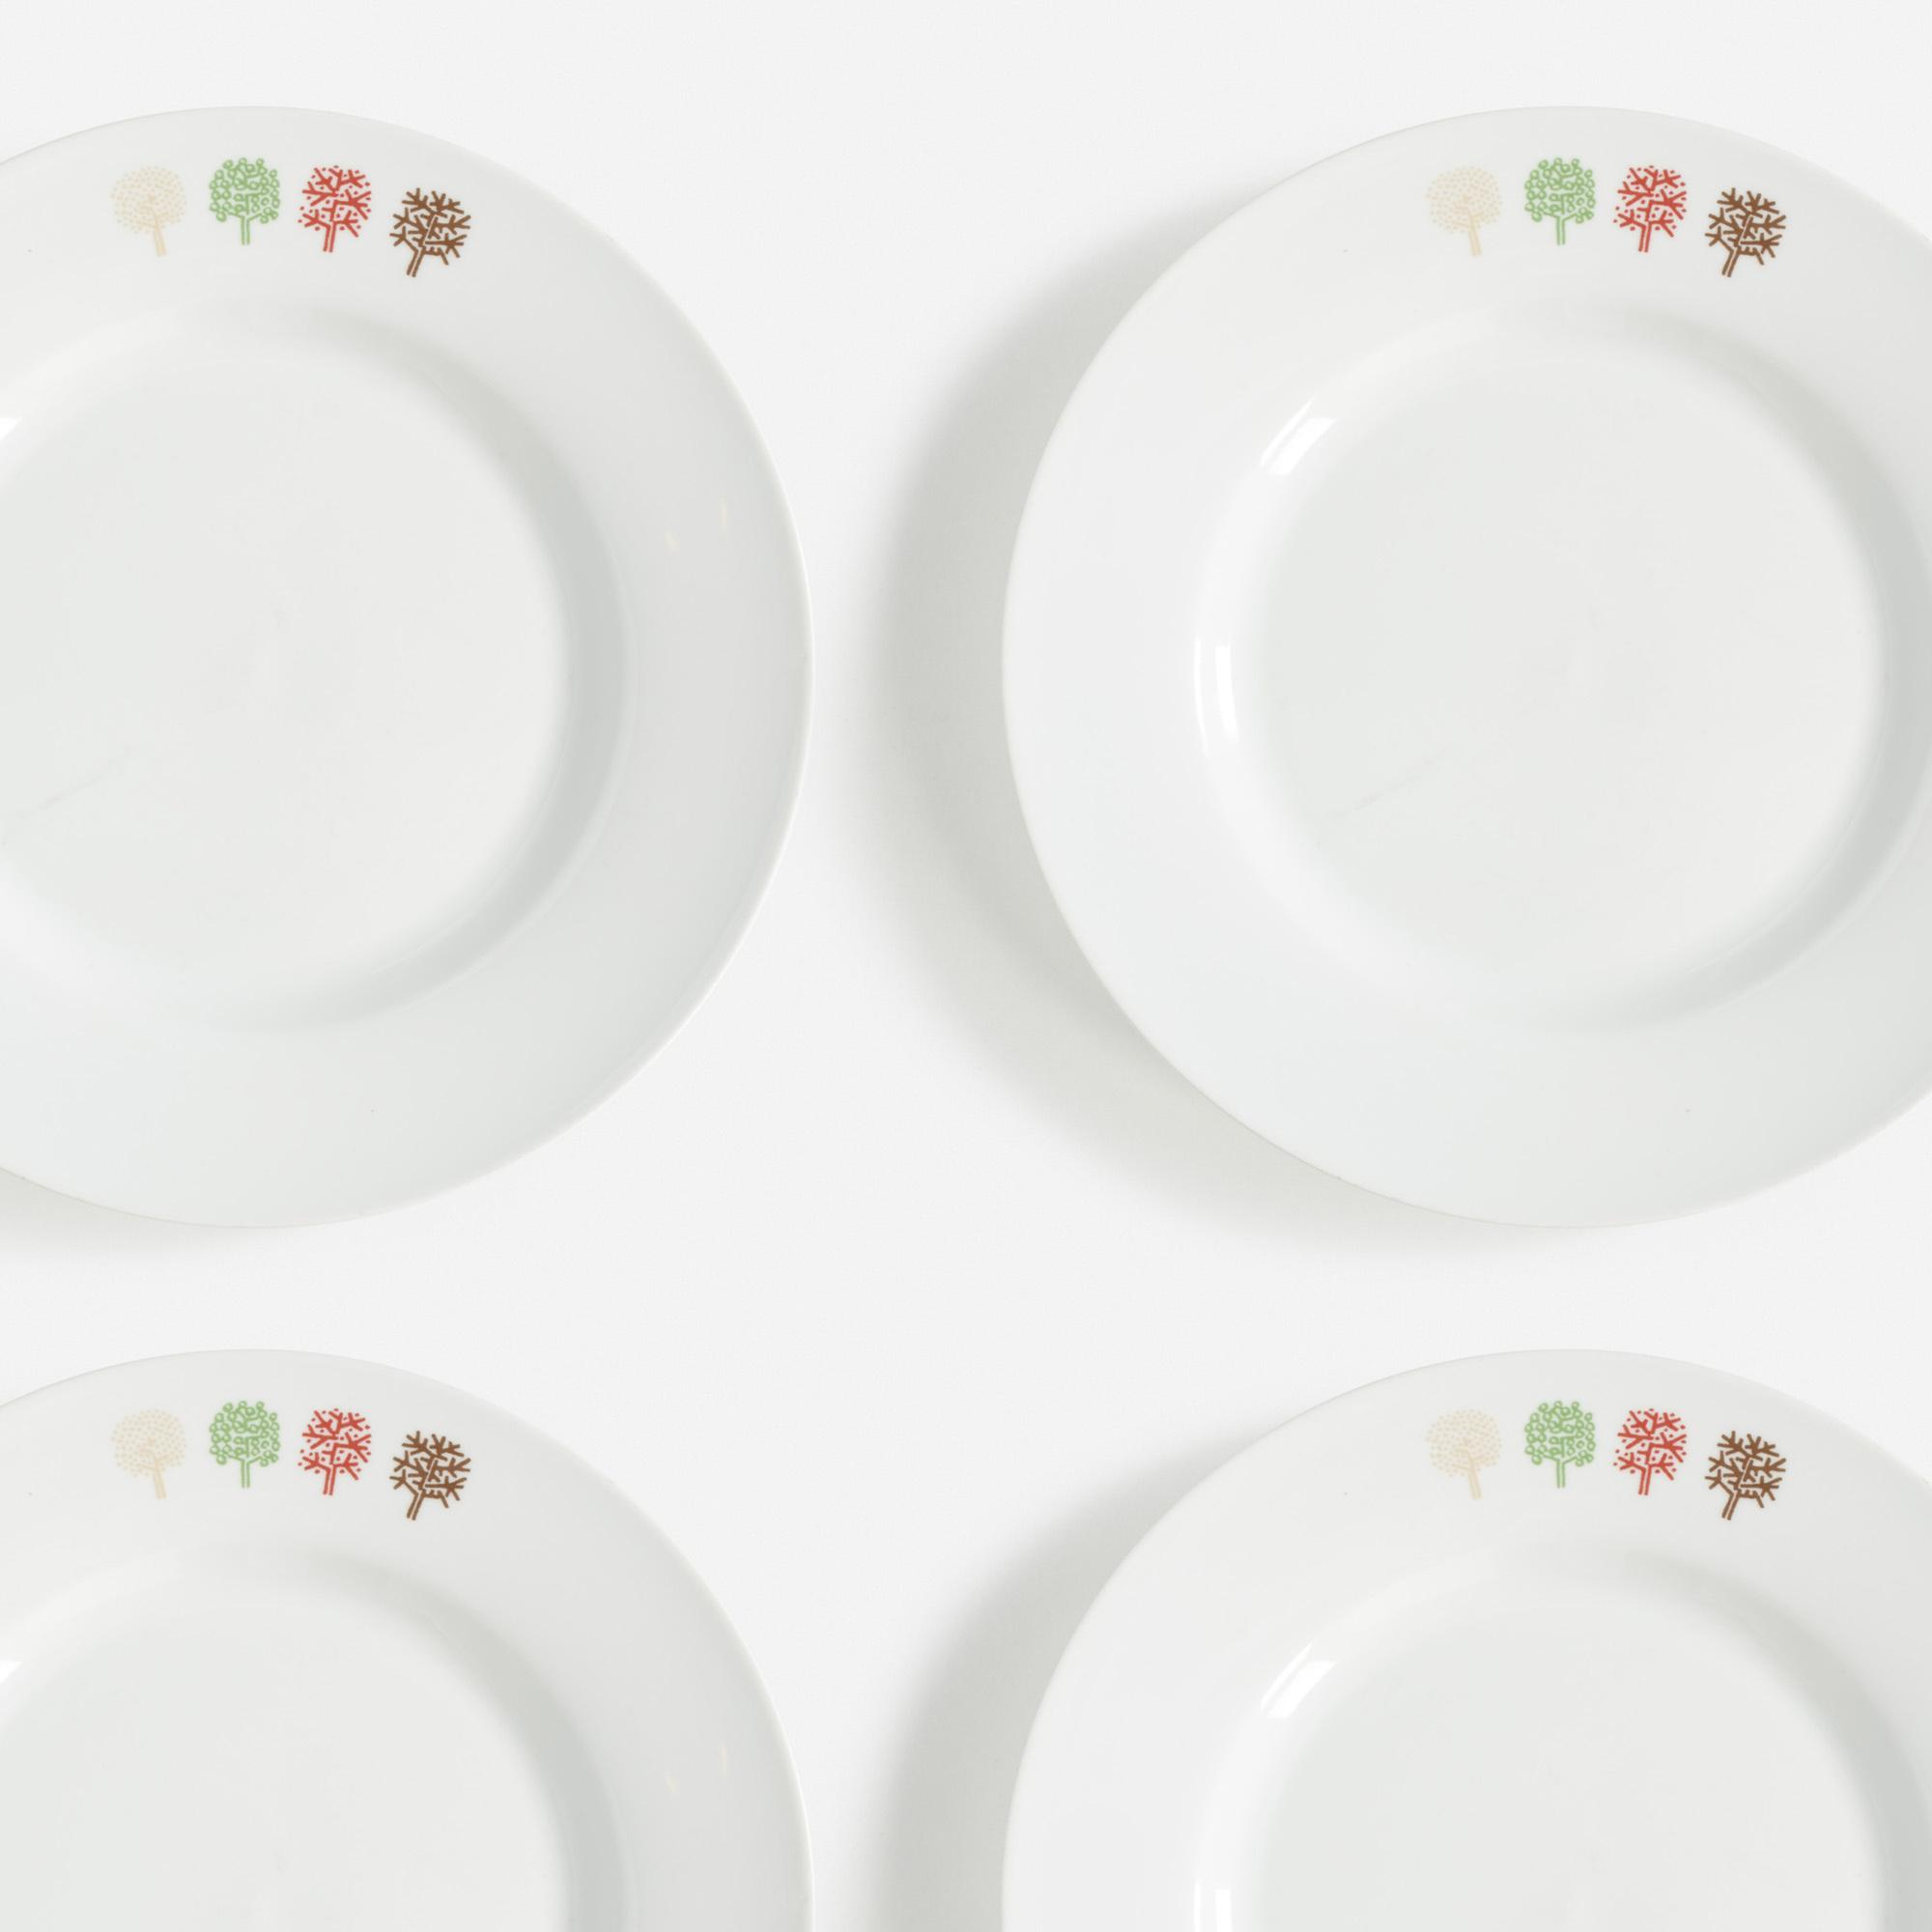 737:  / Four Seasons plates, set of twelve (1 of 1)